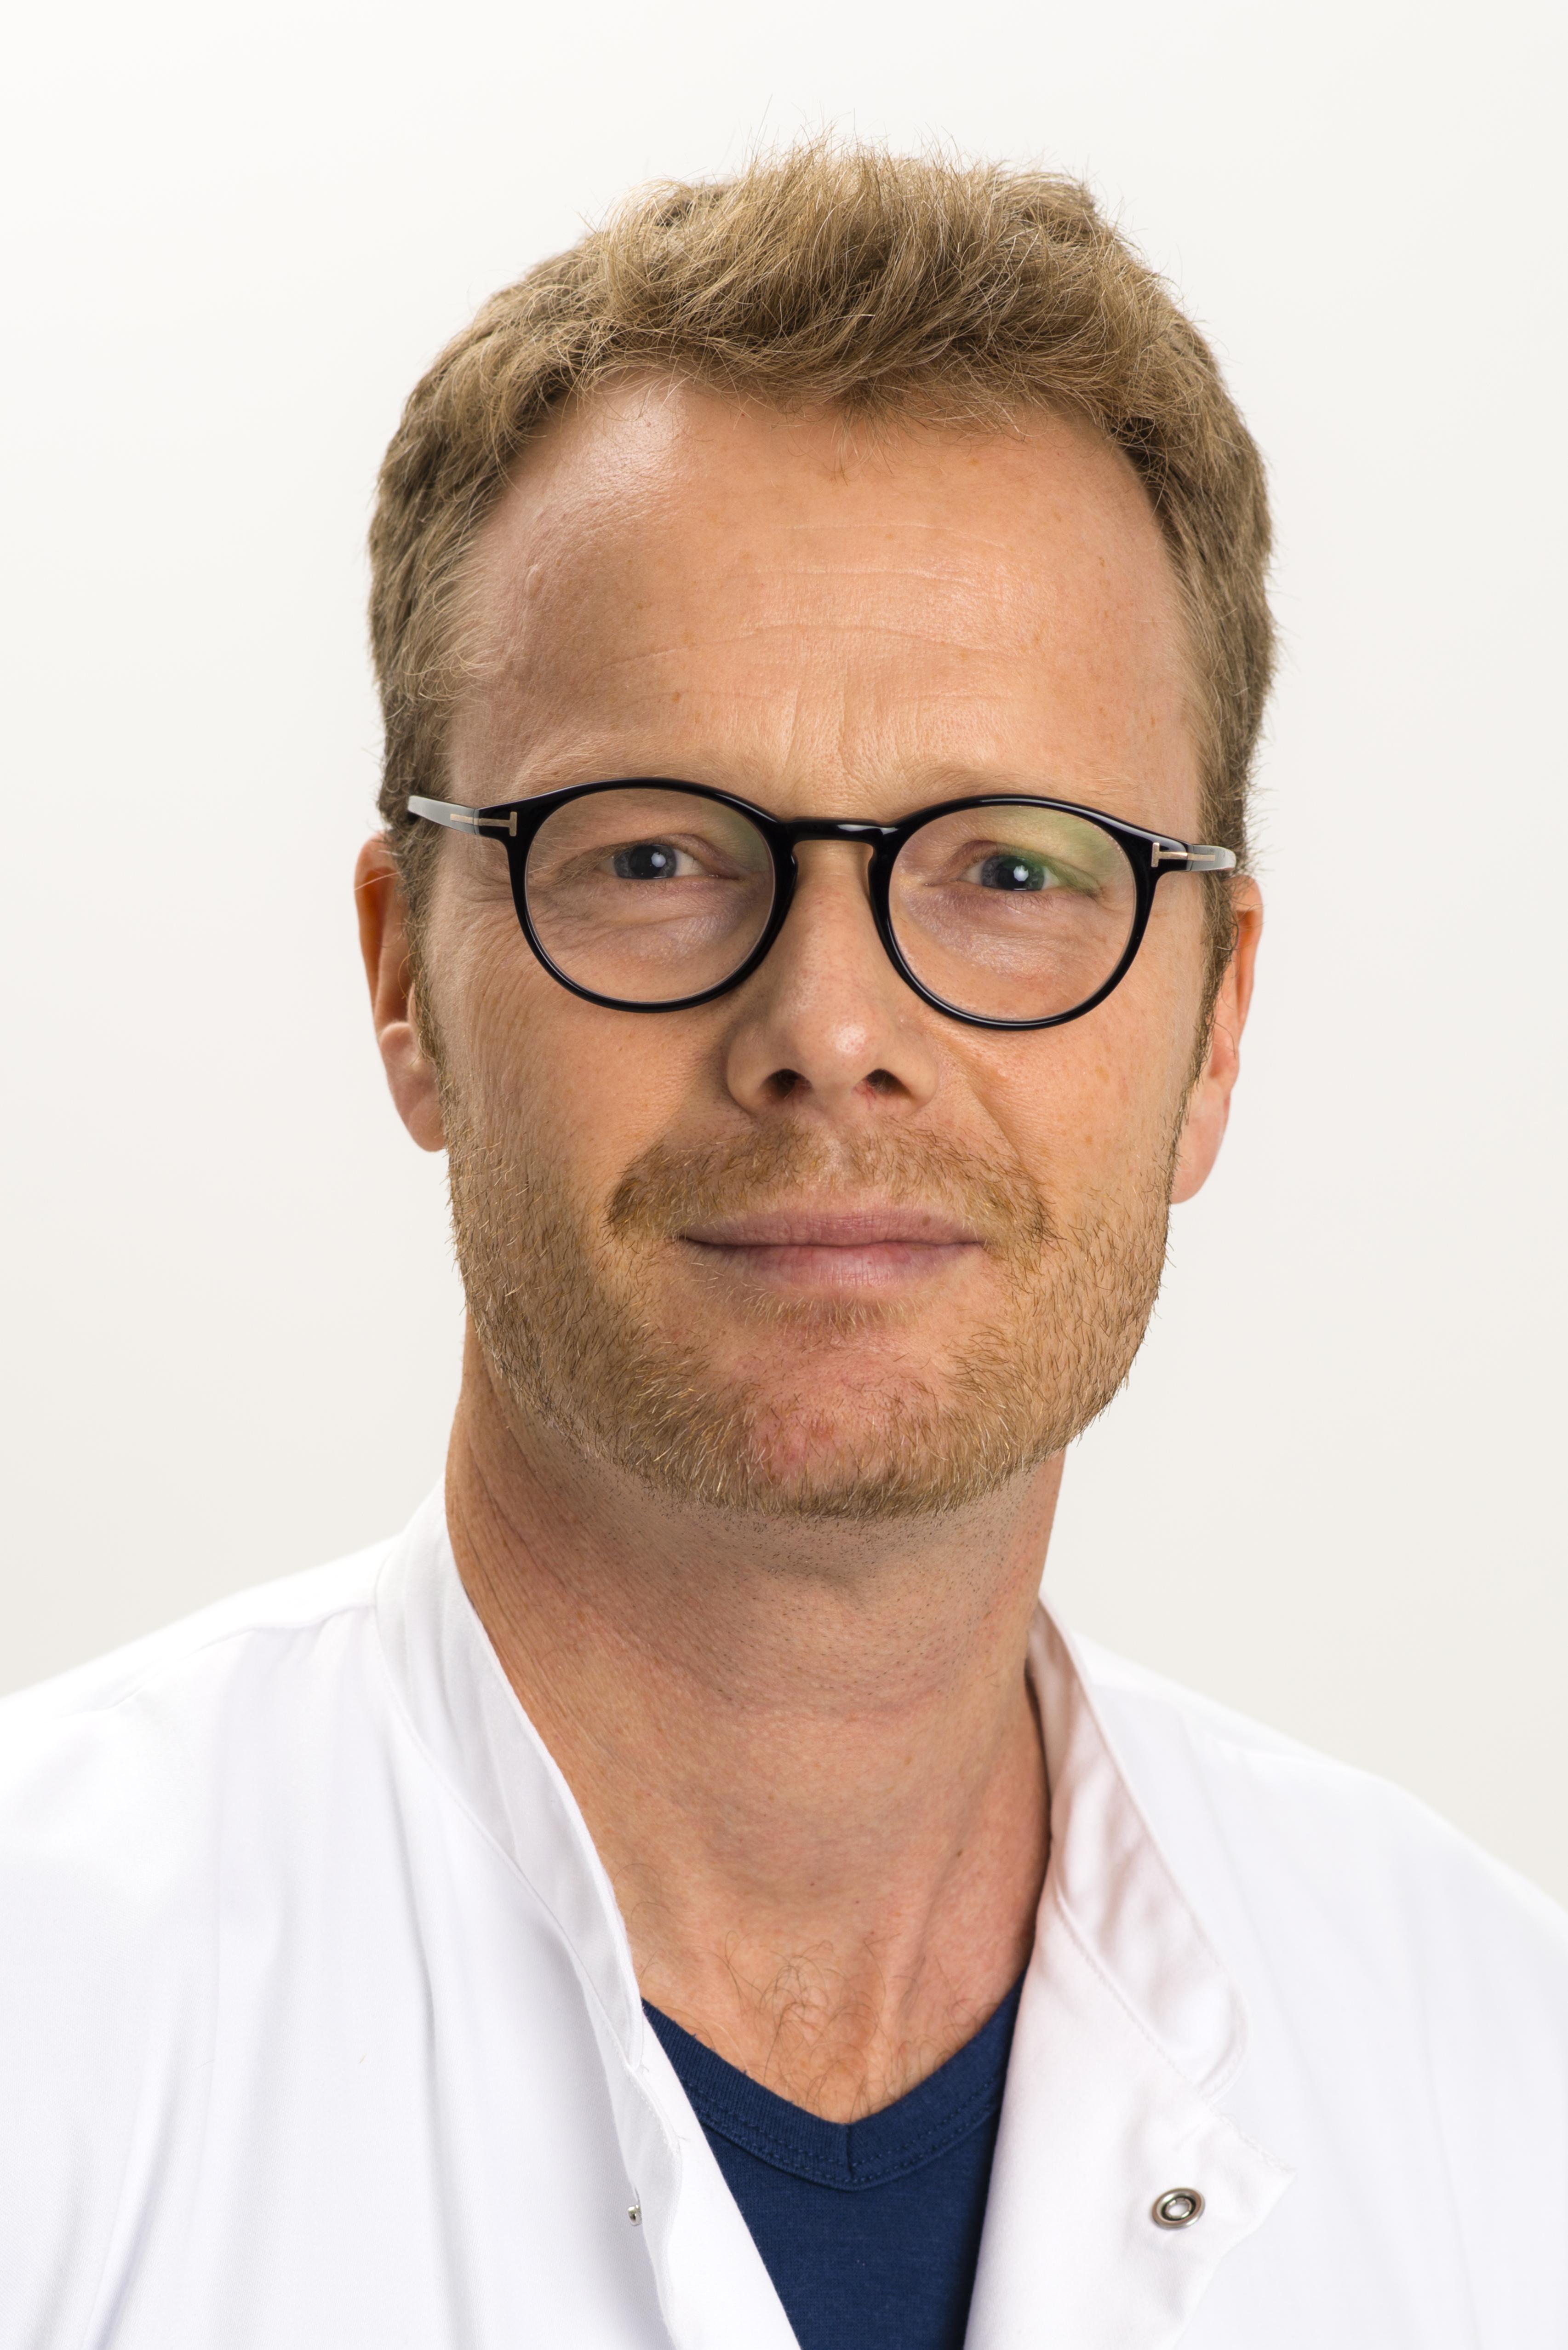 Jakob Gjedsted